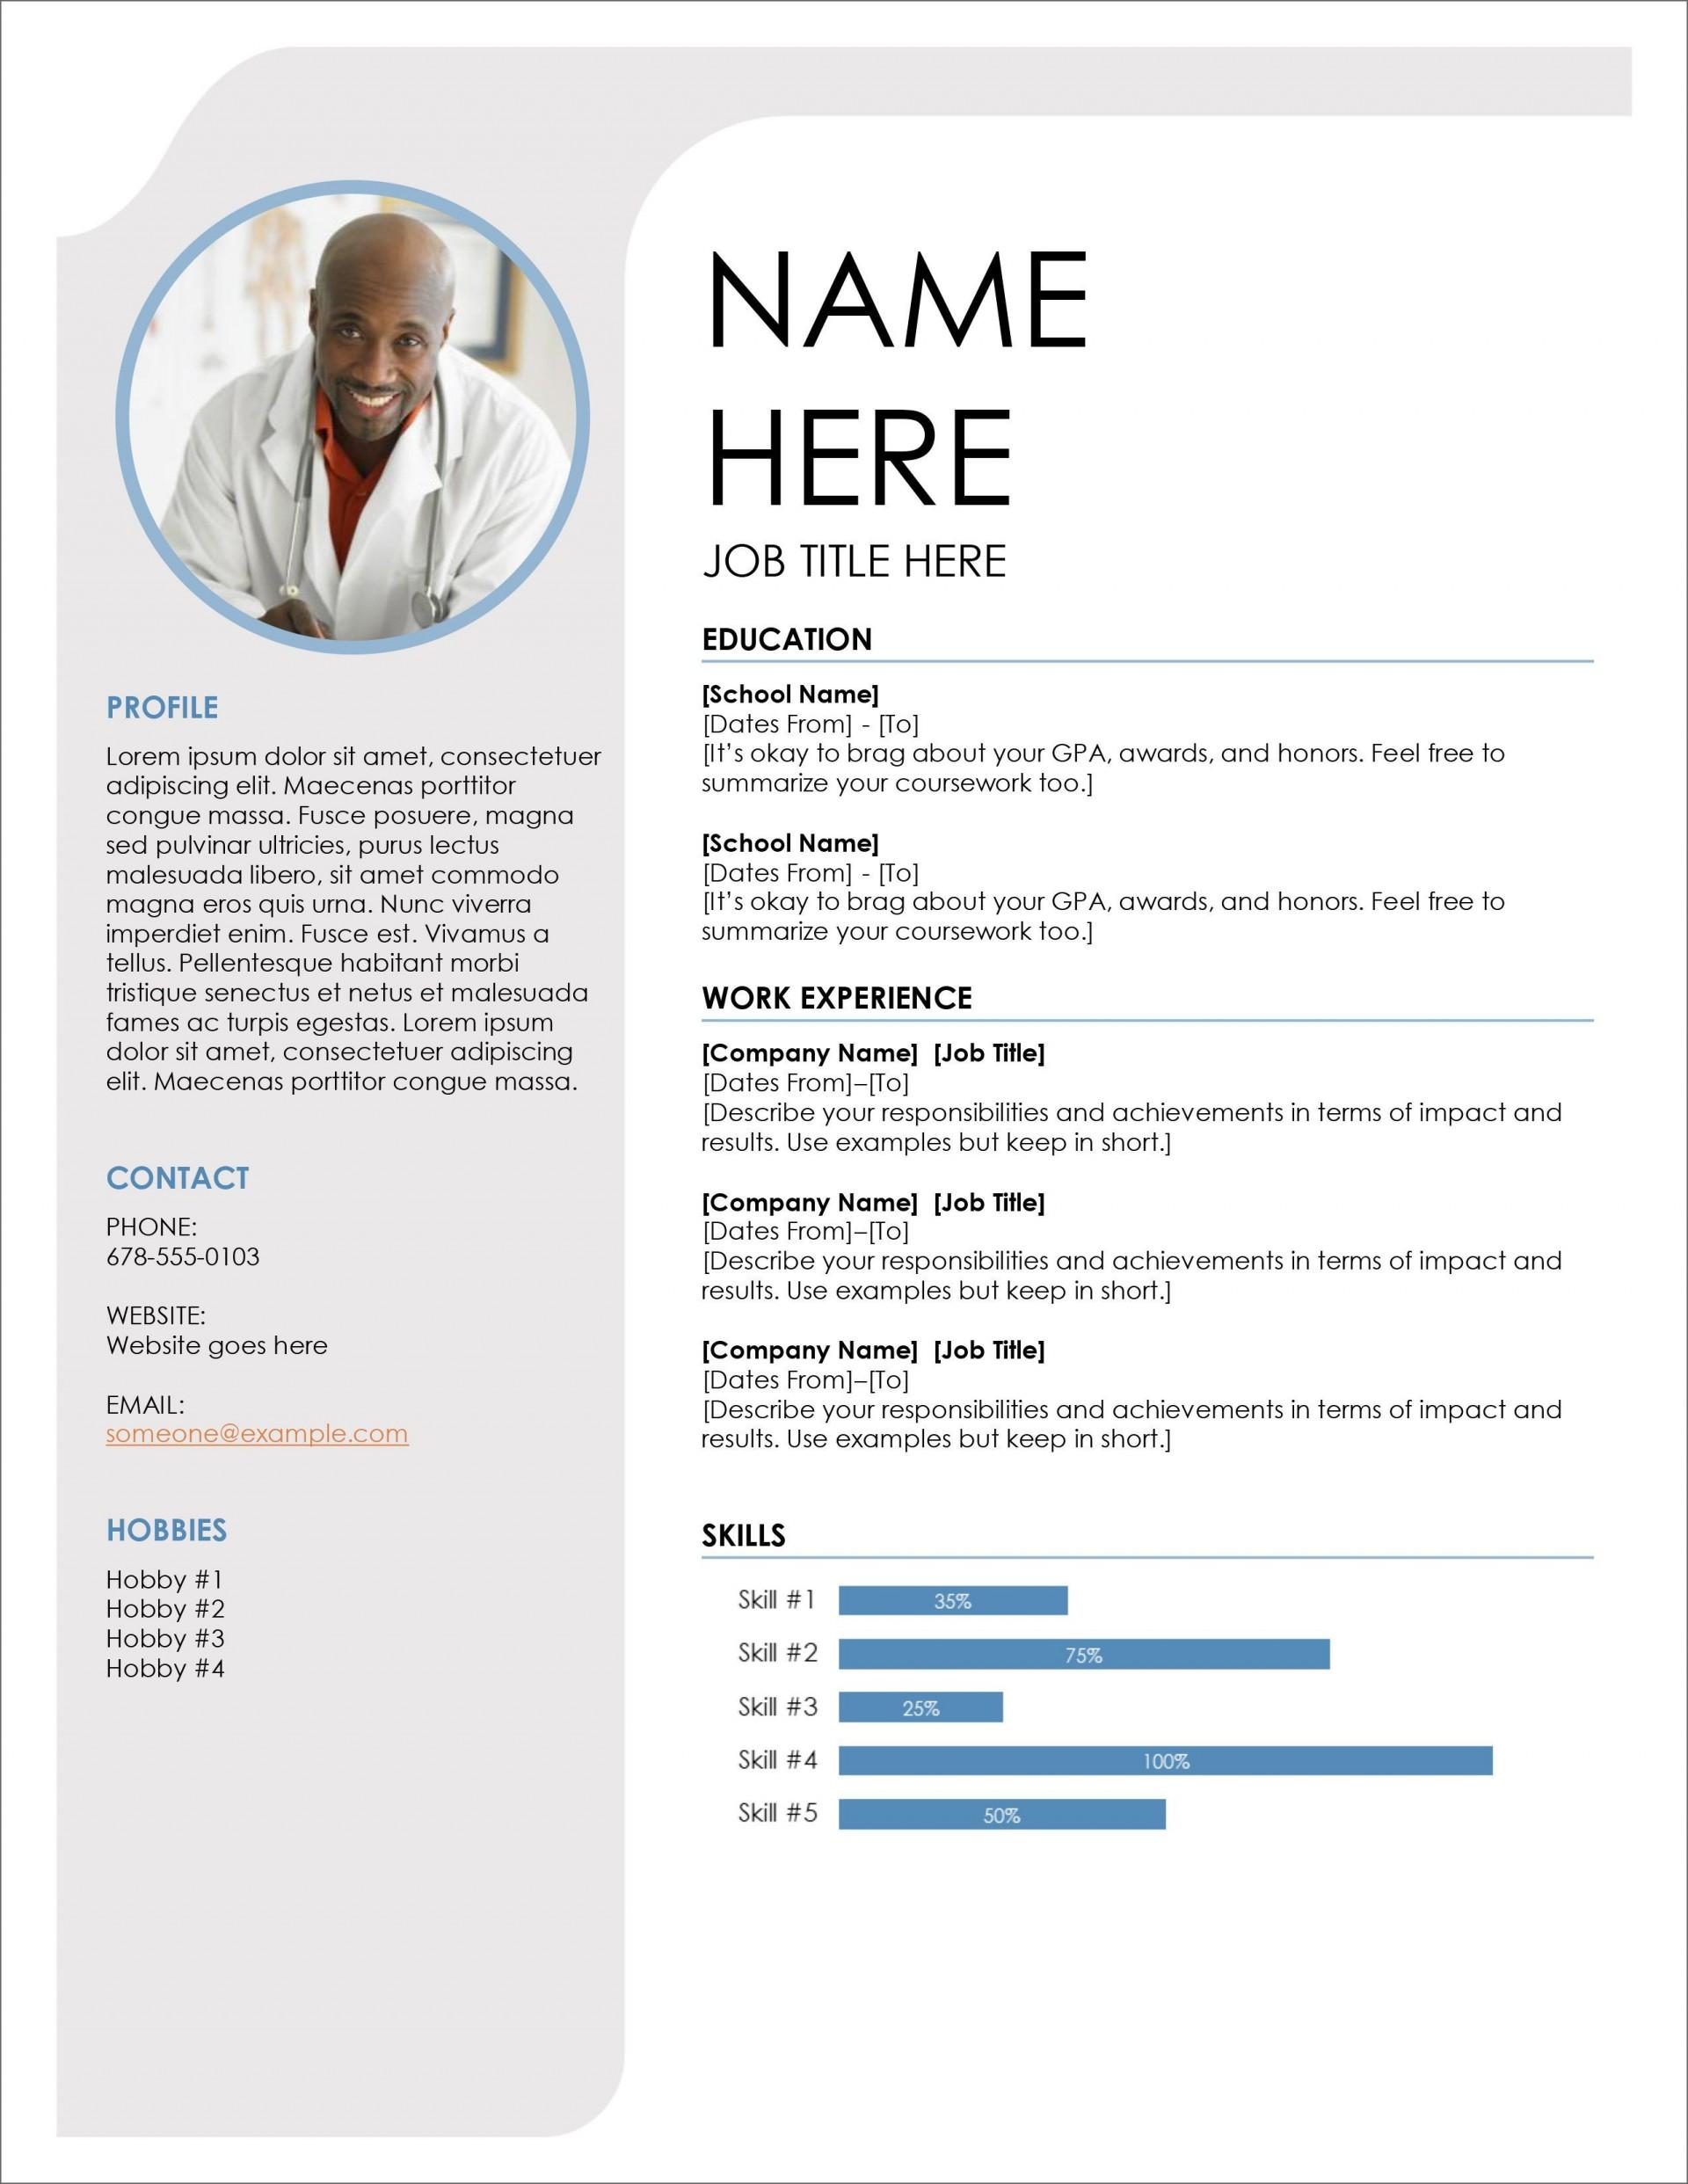 007 Impressive M Word Template Free Download Design  Microsoft Office Invoice Letterhead 2003 Resume1920